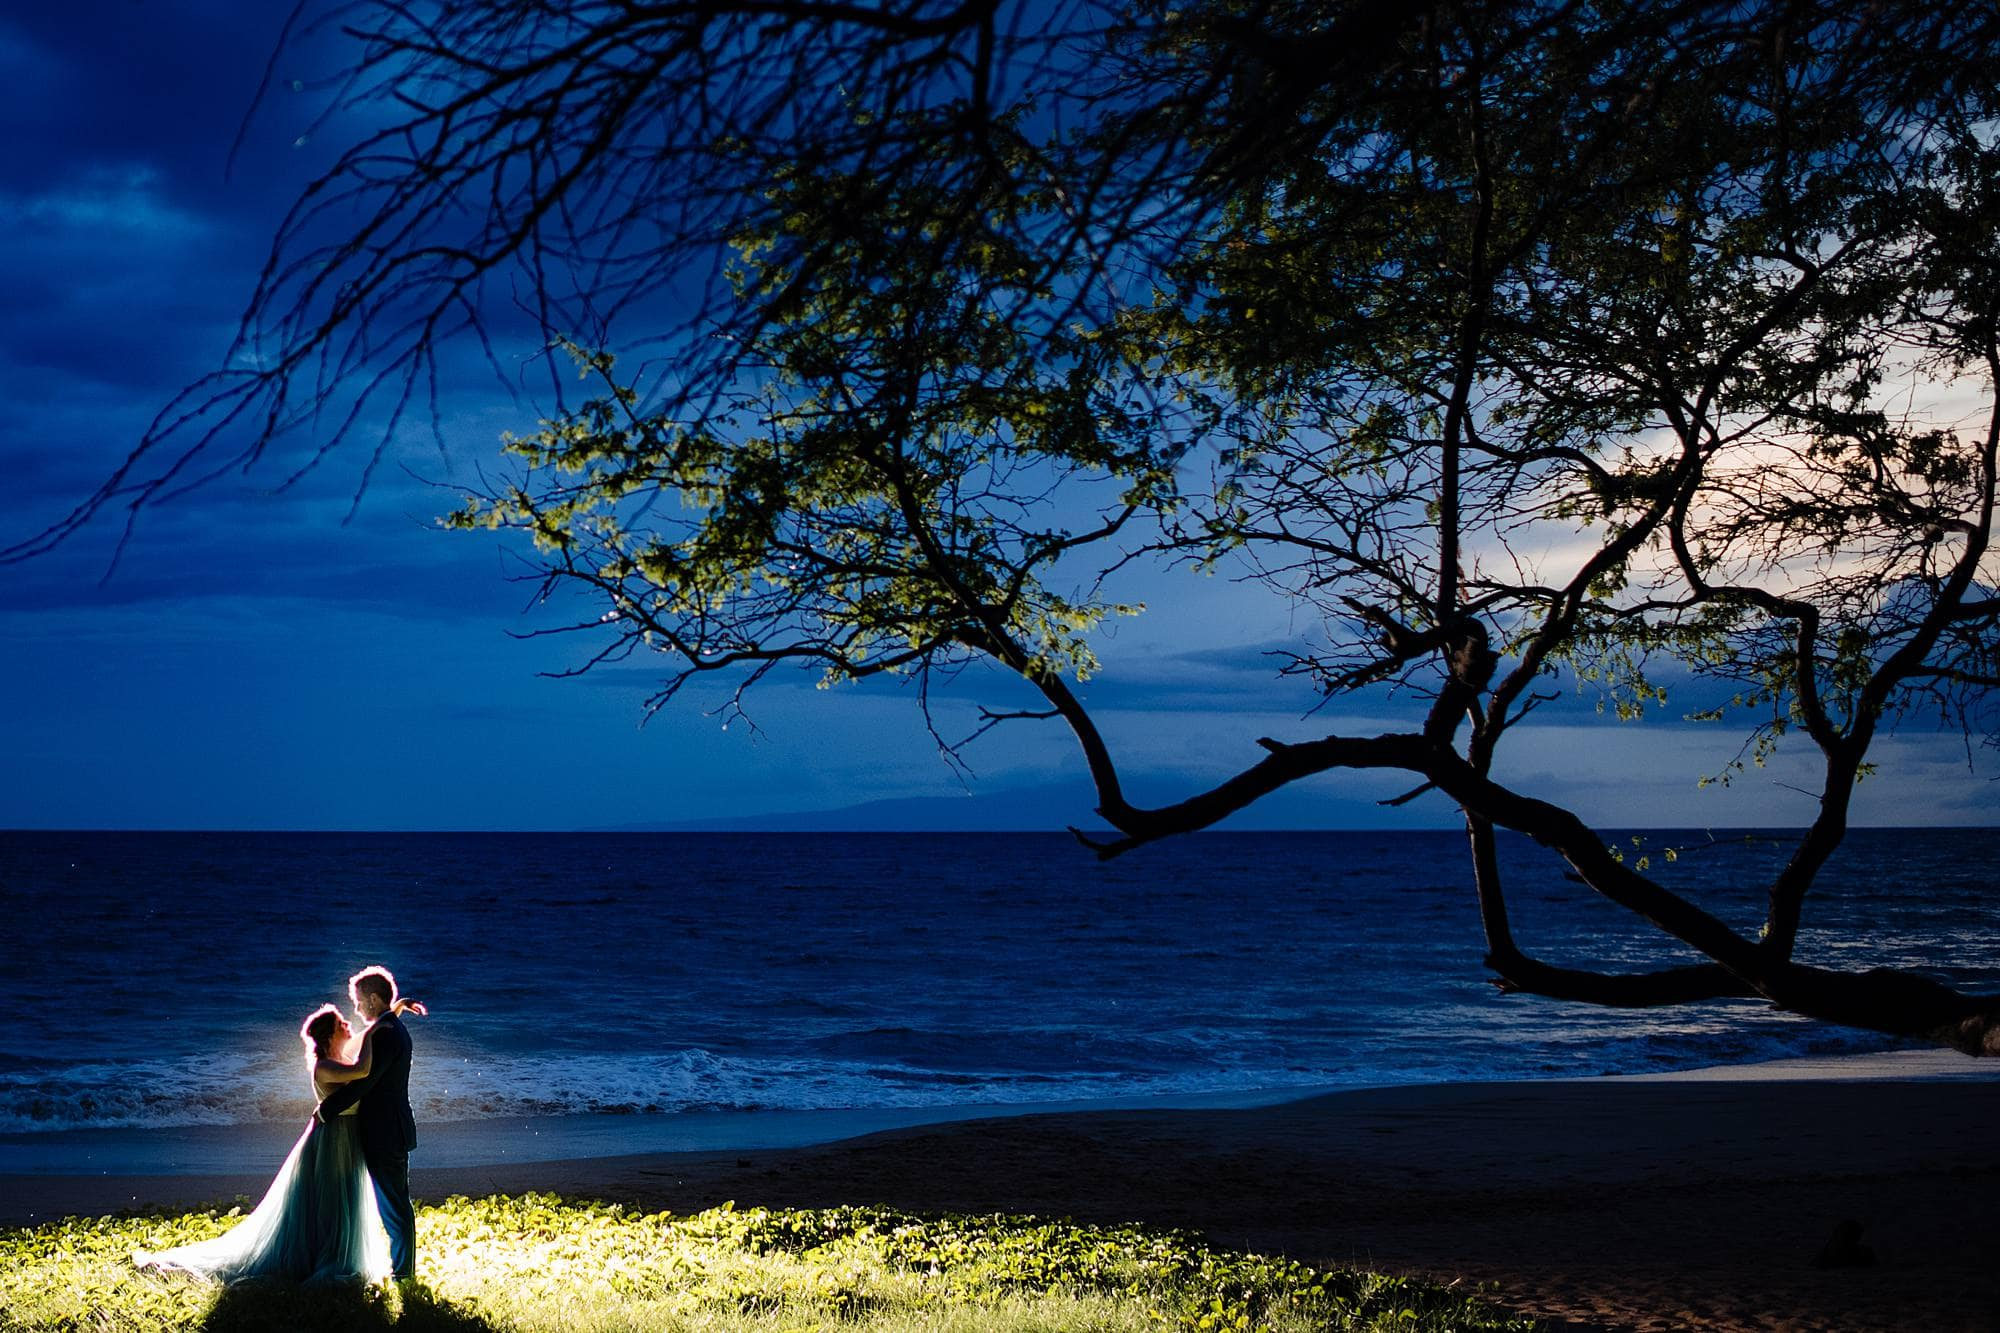 backlit portrait in maui, hawaii